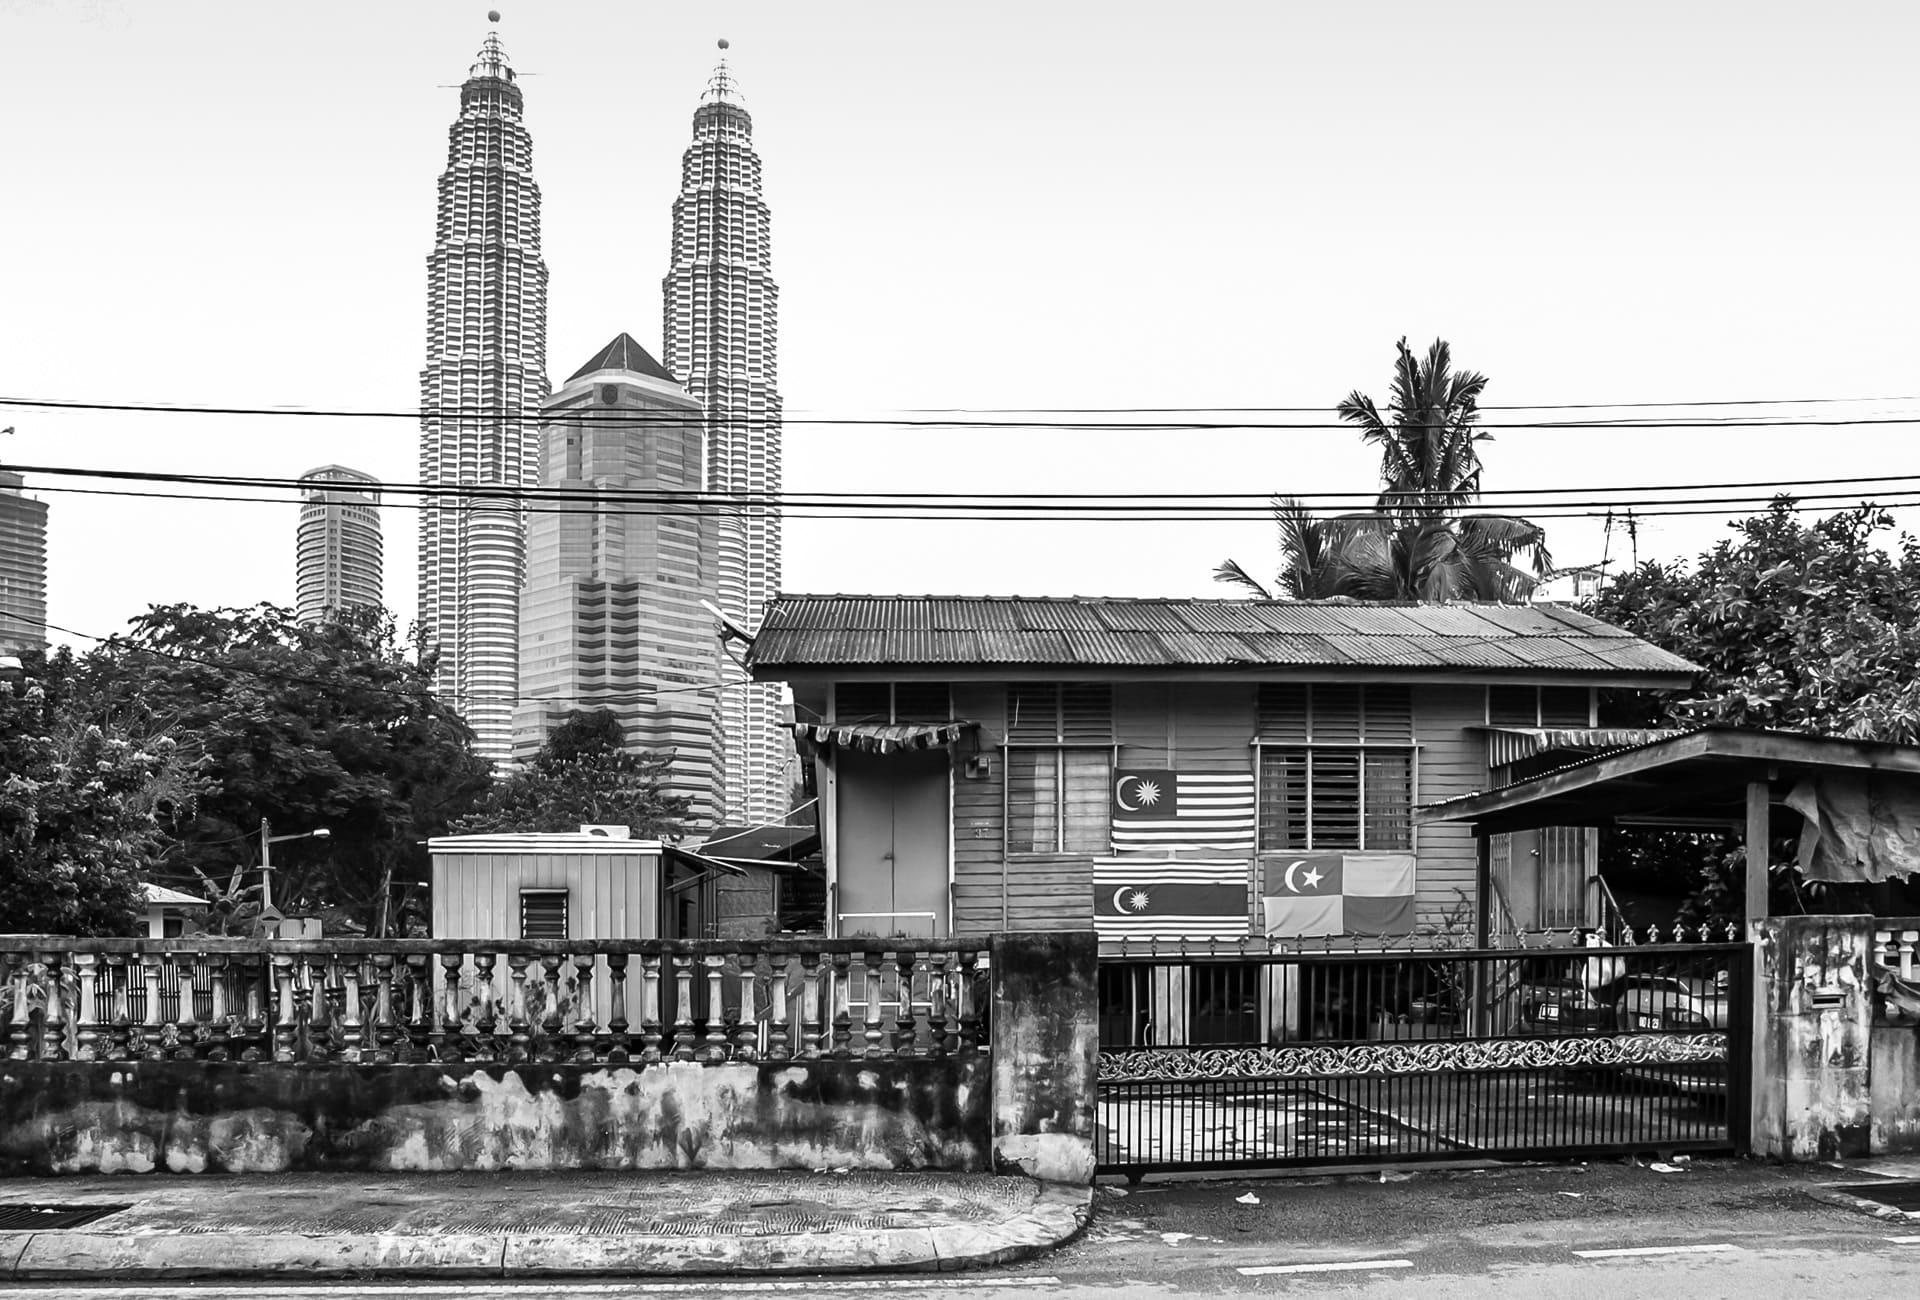 simoarts-com-simone-kessler-fotokunst-nuernberg-werden-Kuala-lumpur-2